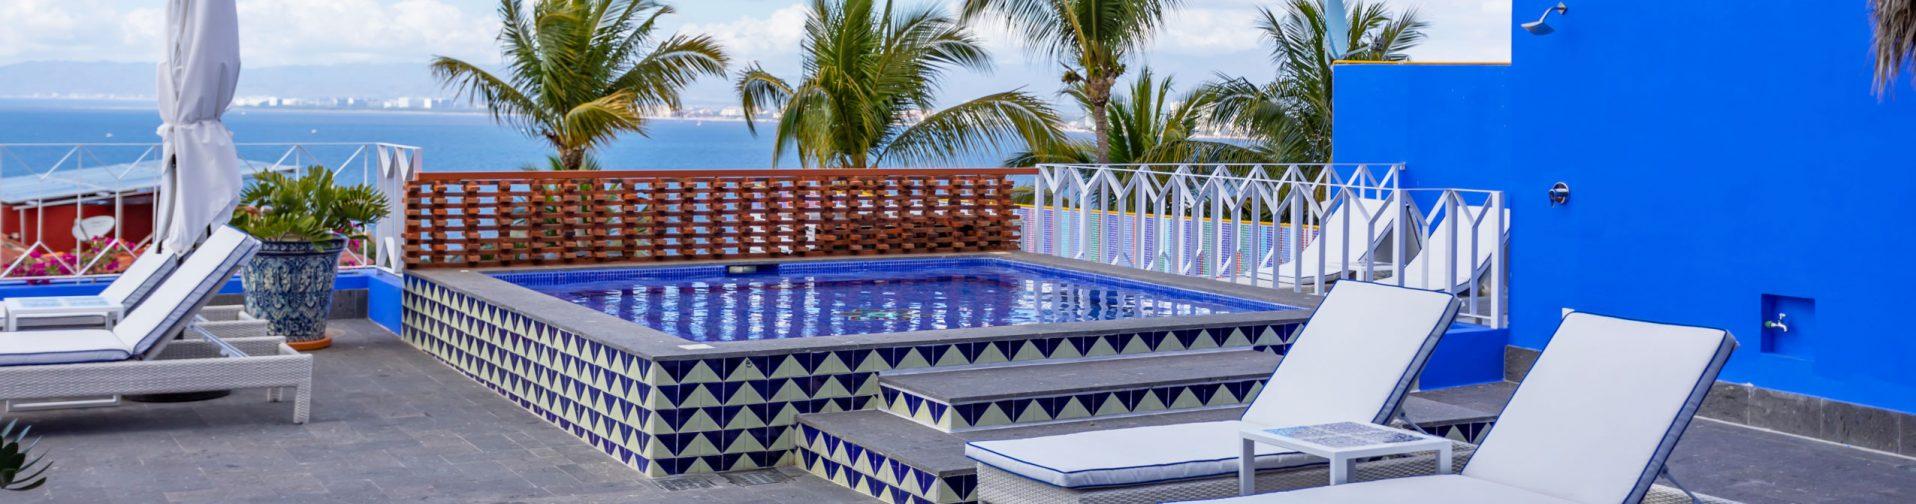 Mexico Boutique Hotels